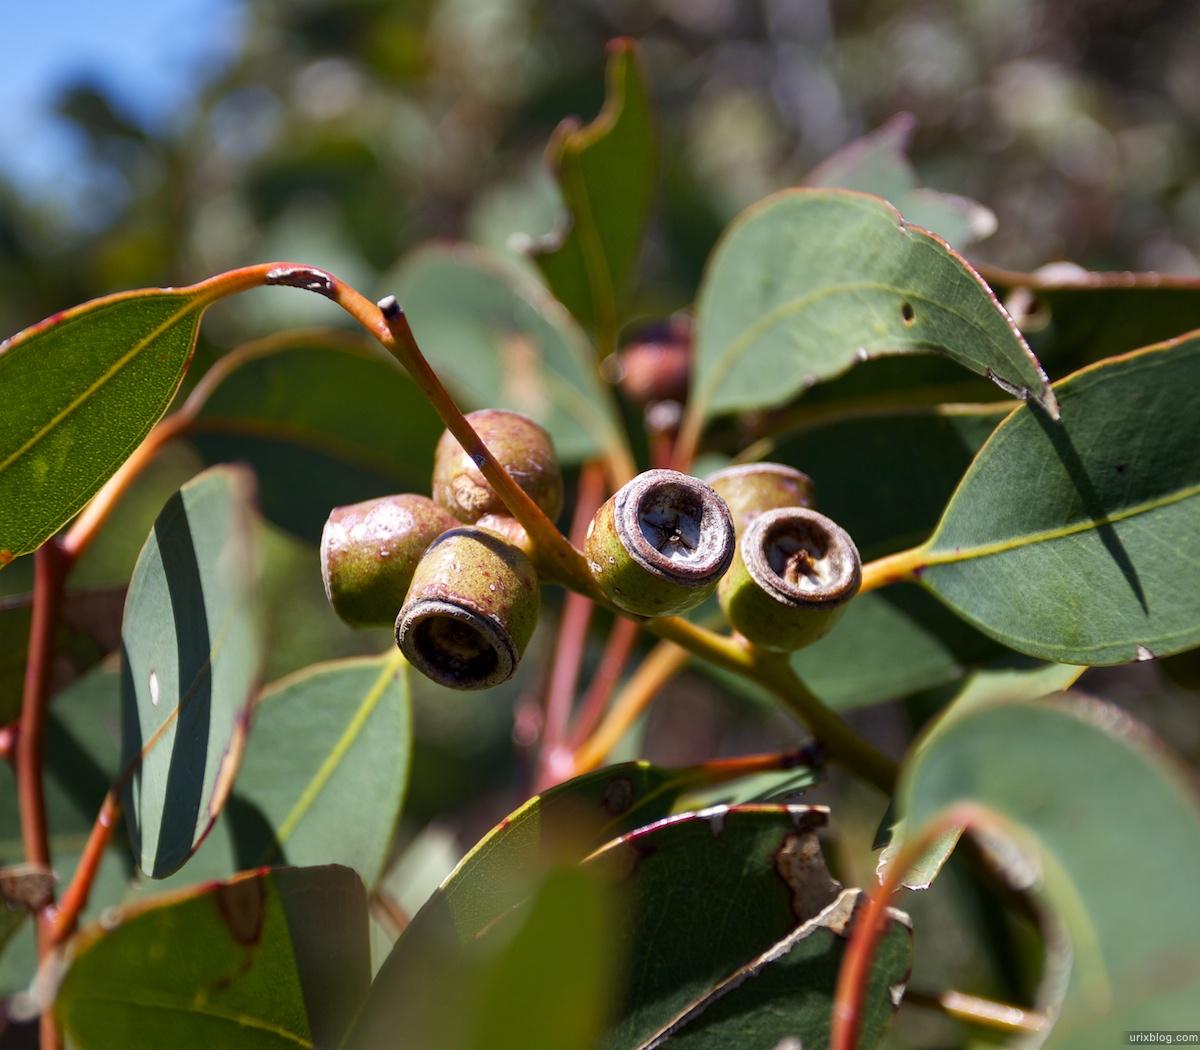 2011 South Australia, Kangaroo Island, Остров Кенгуру, Южная Австралия, Flinders Chase, plant, растение